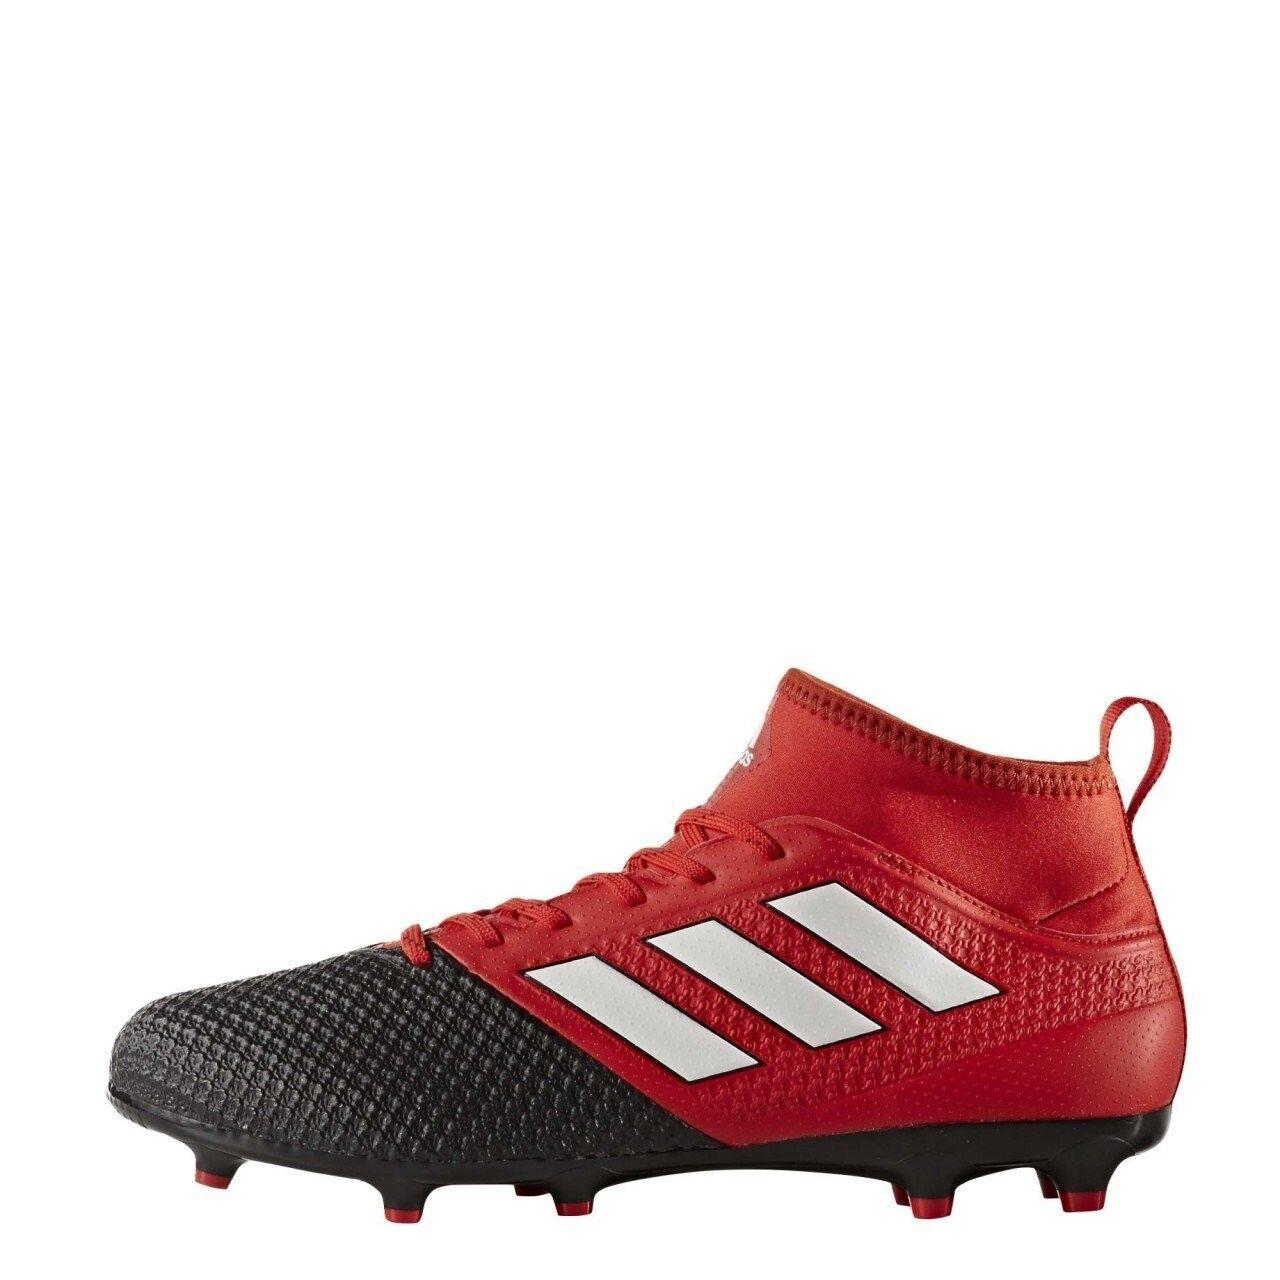 Adidas Botines para hombre Ace 17.3 FG Botines Adidas para Balonpié Negro/Rojo BA8506 799f92